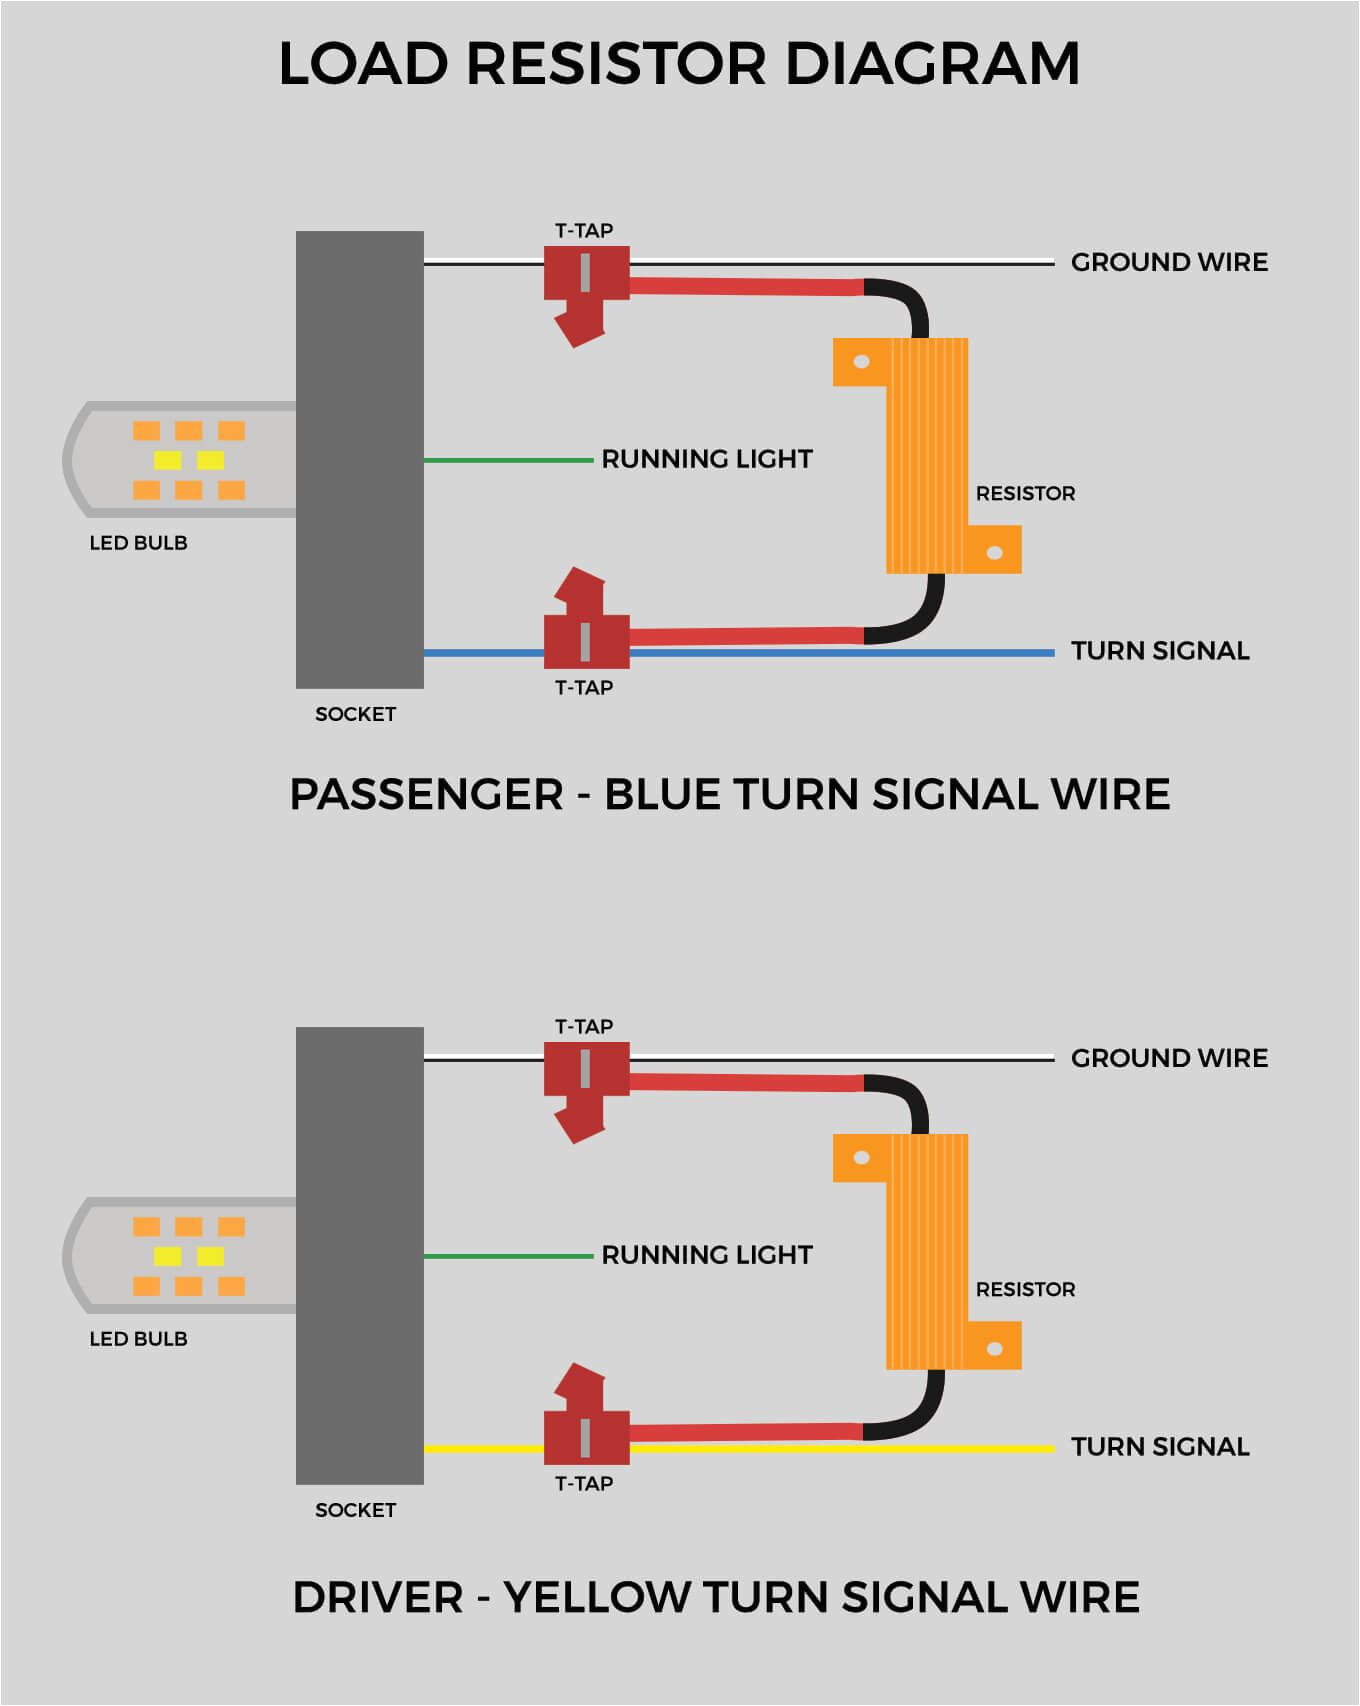 Signal Light Flasher Wiring Diagram Turn Signal Light Wiring Diagram Wiring Diagram Paper